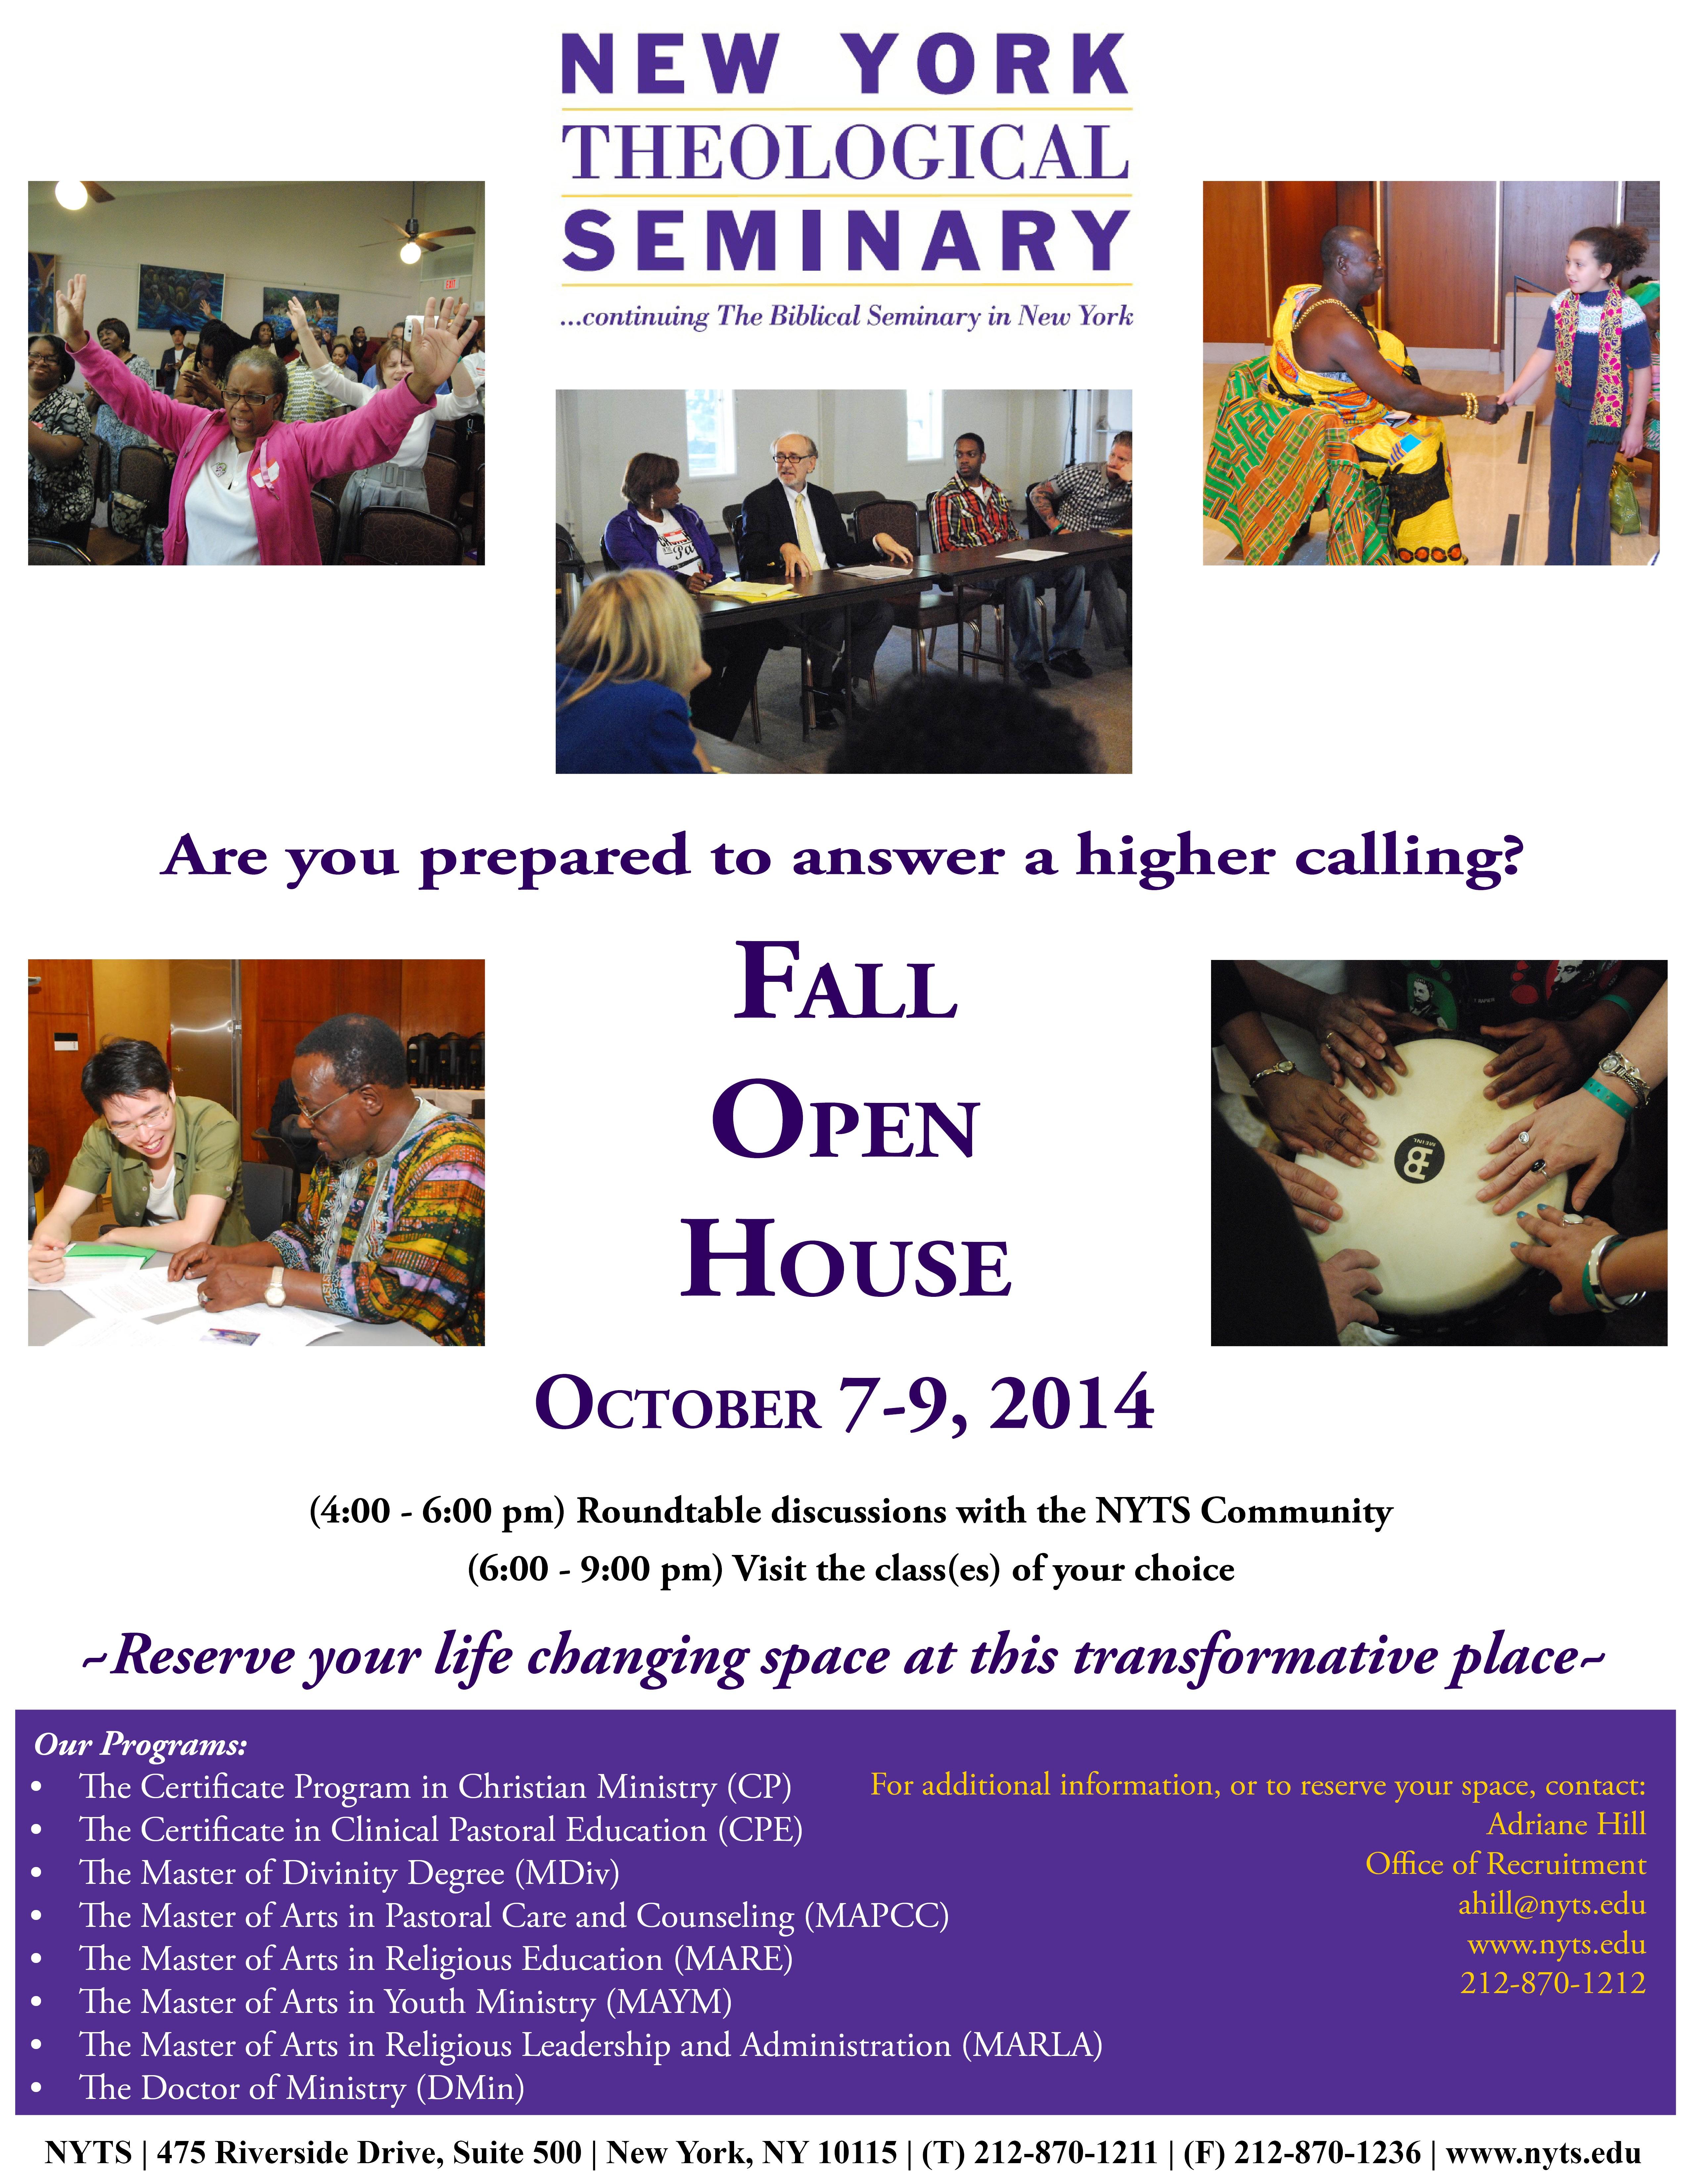 Open House Fall 2014EDIT